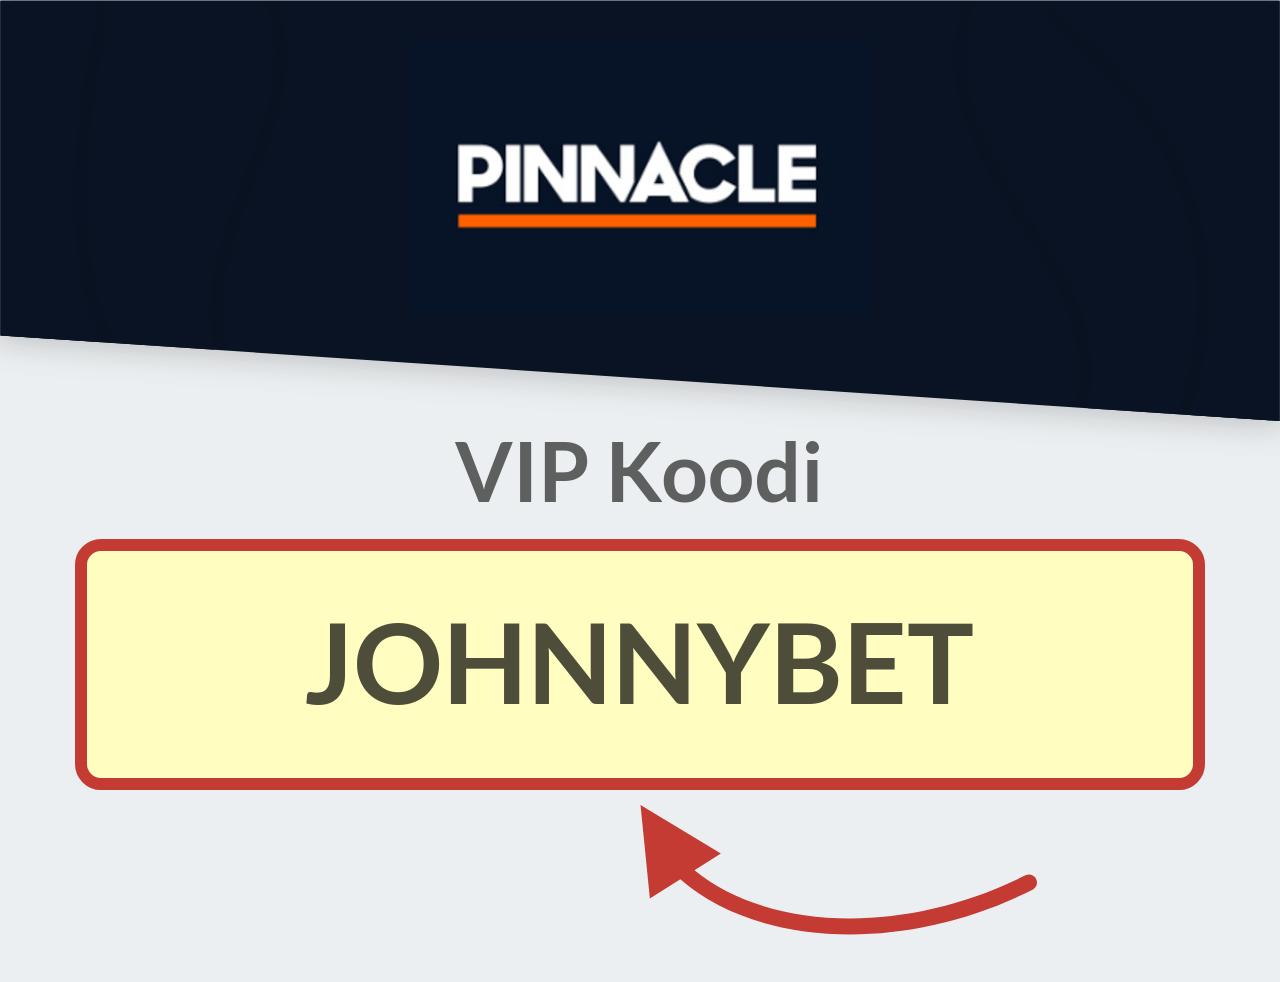 Pinnacle VIP Koodi